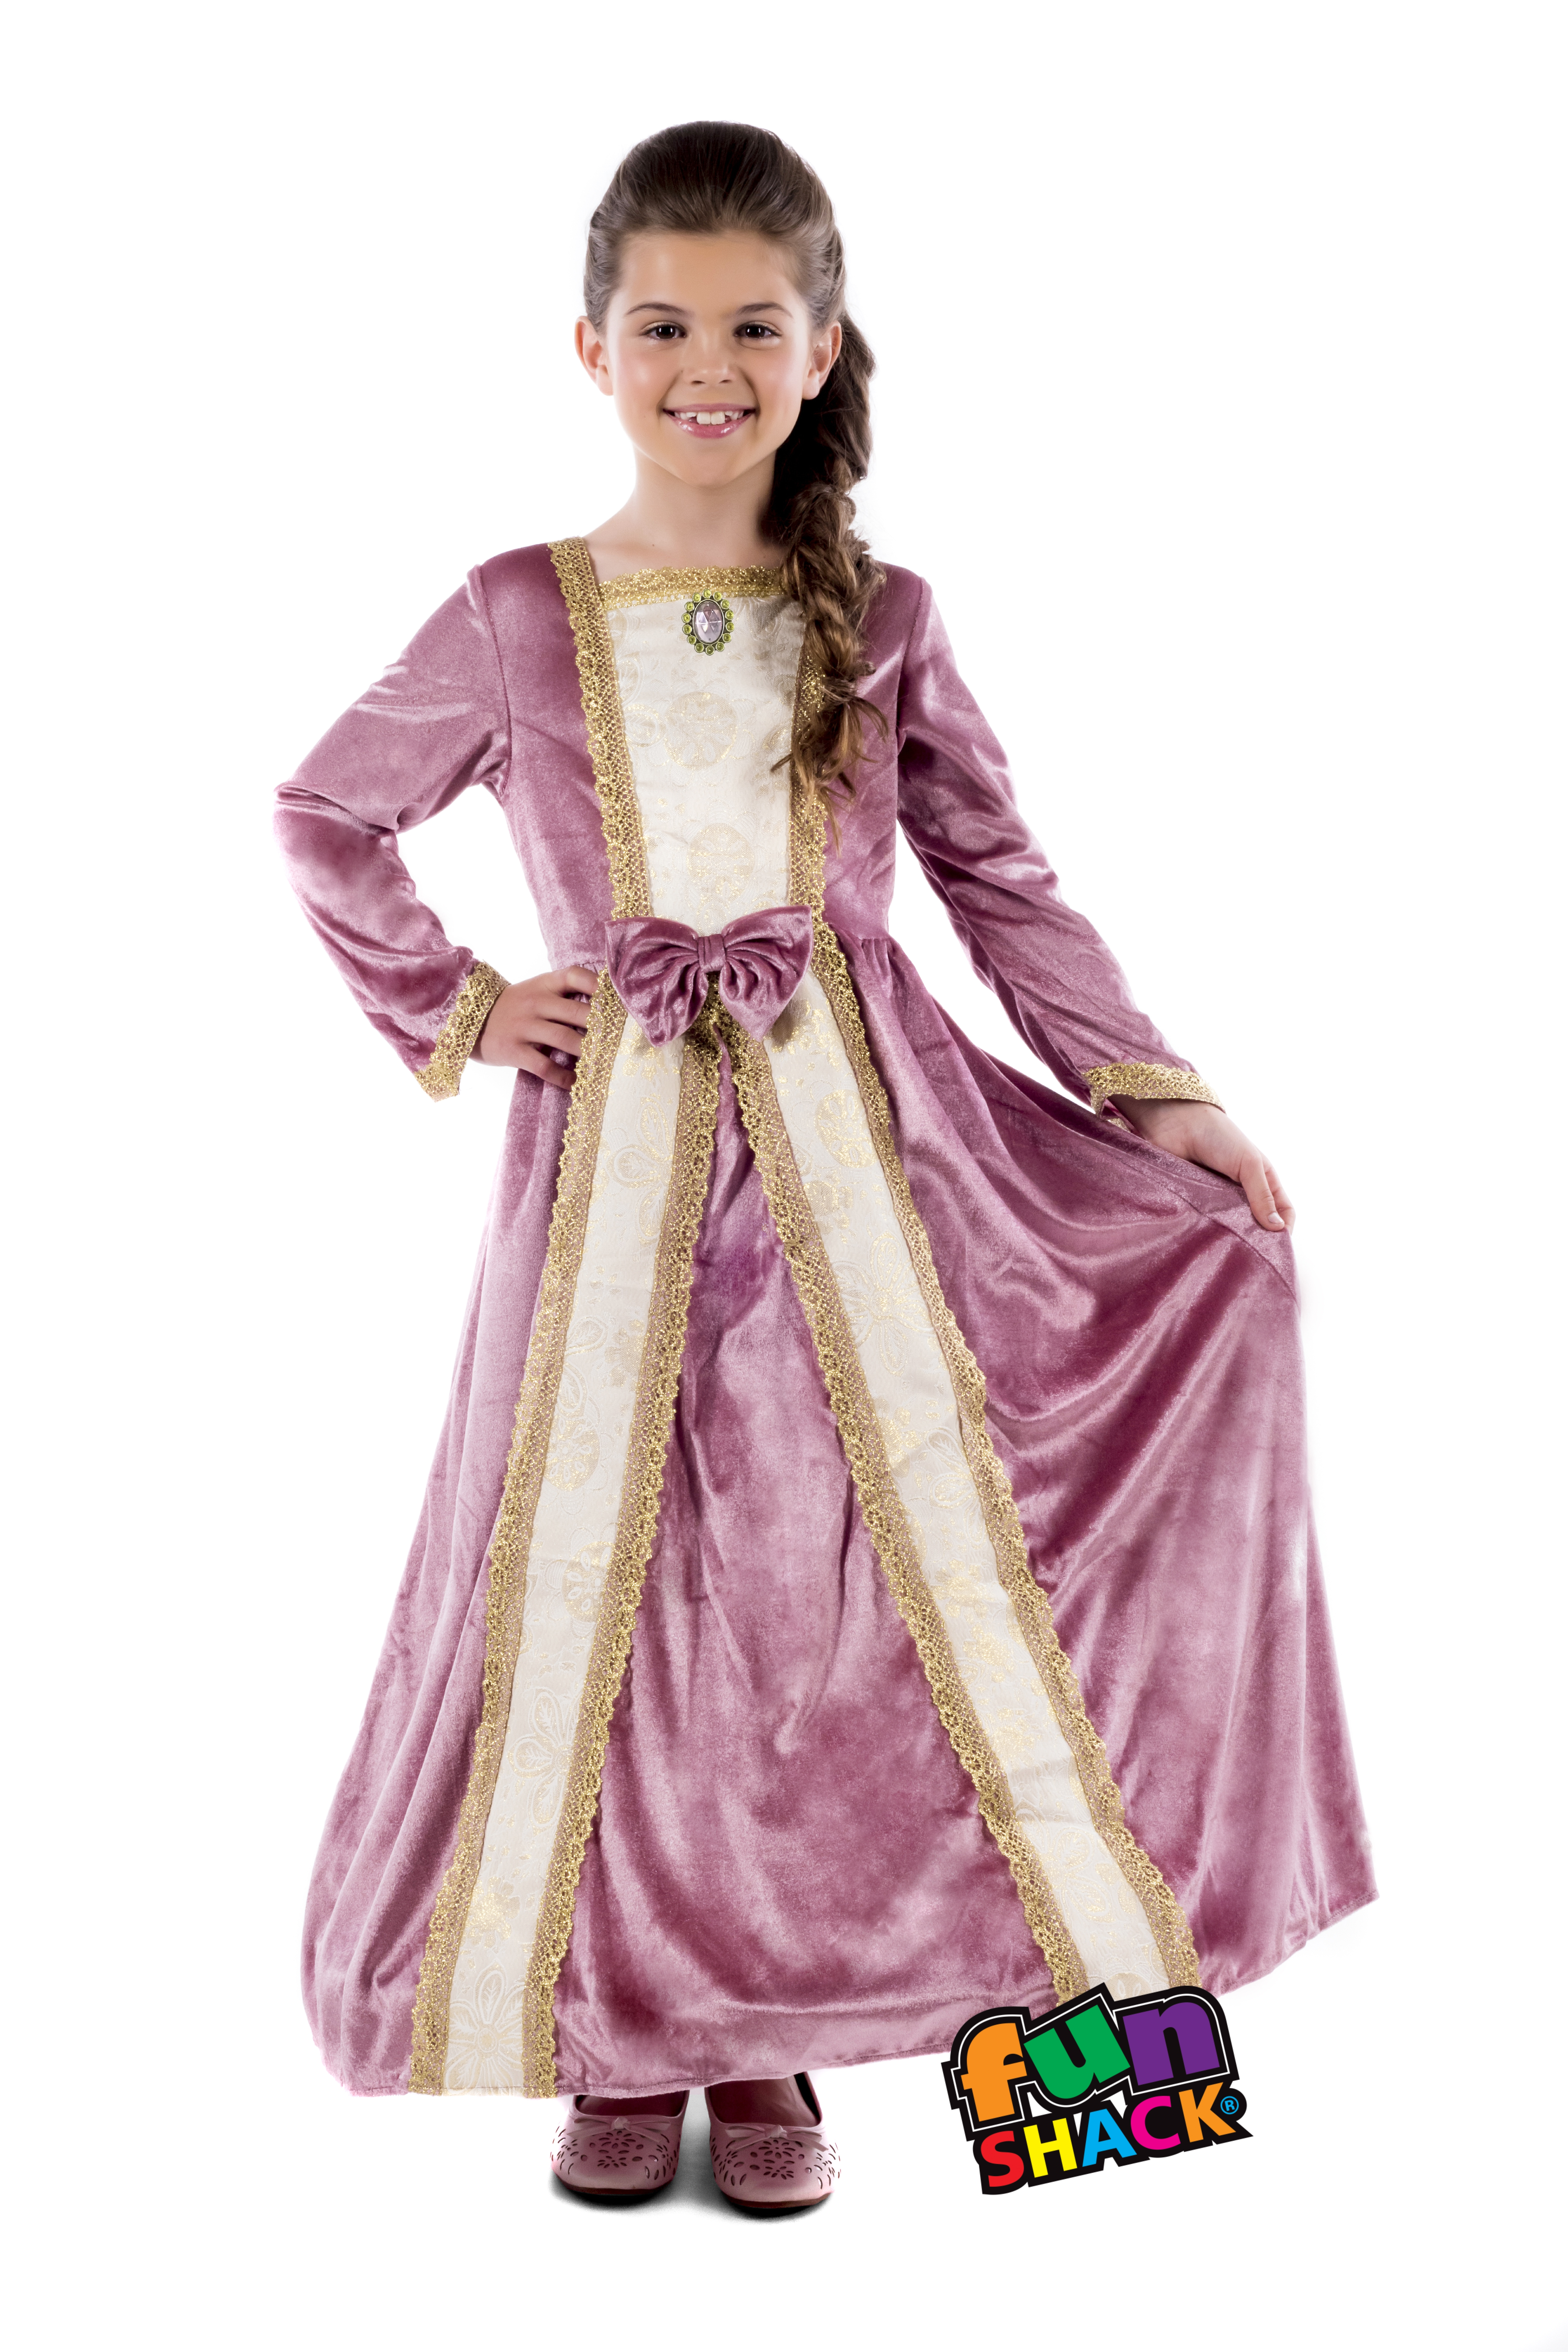 Girls Kids Childs Royal Ball Gown Elizabeth Fancy Dress Costume ...